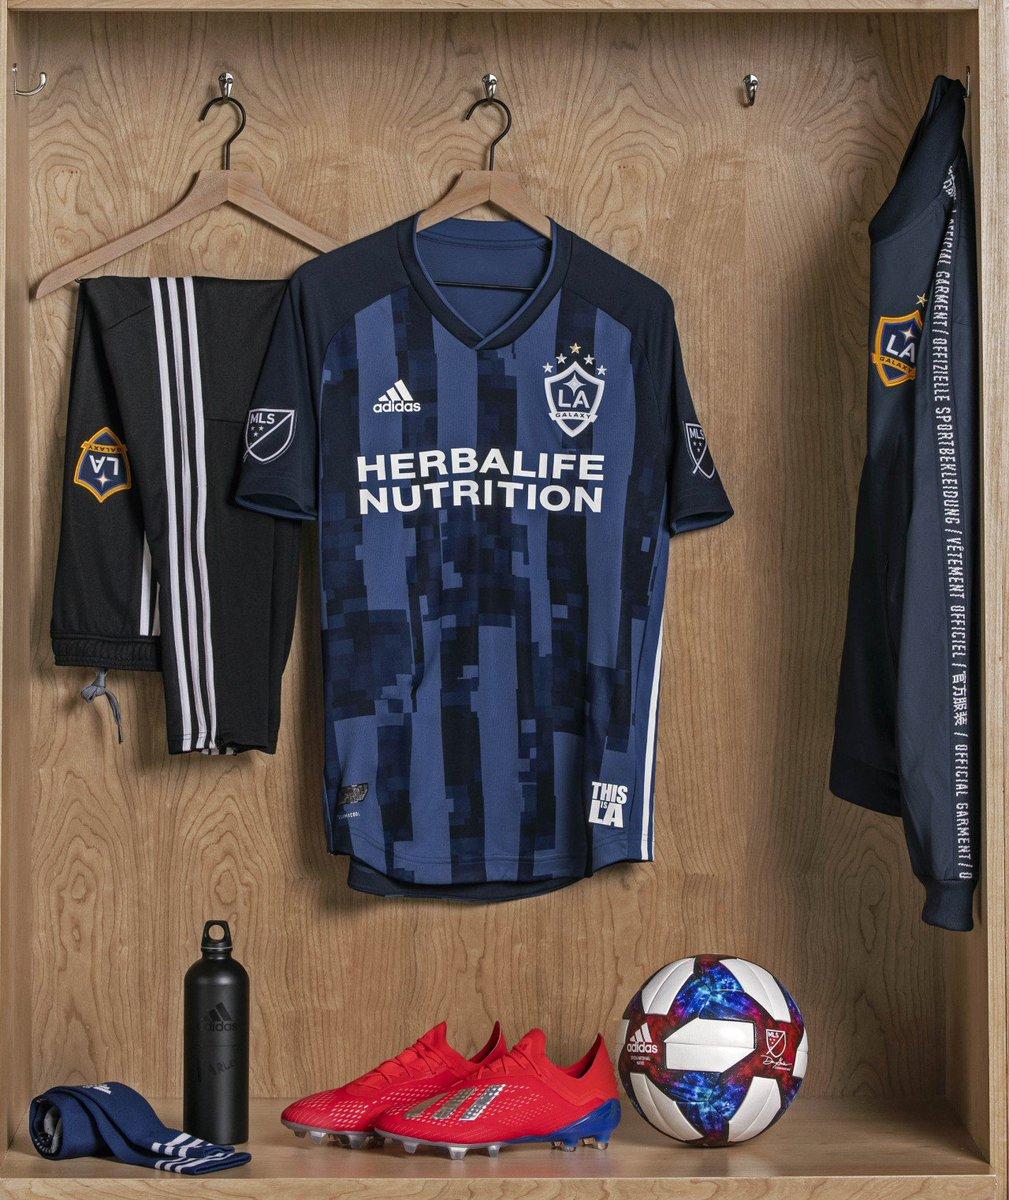 98f0292ea World Soccer Shop on Twitter